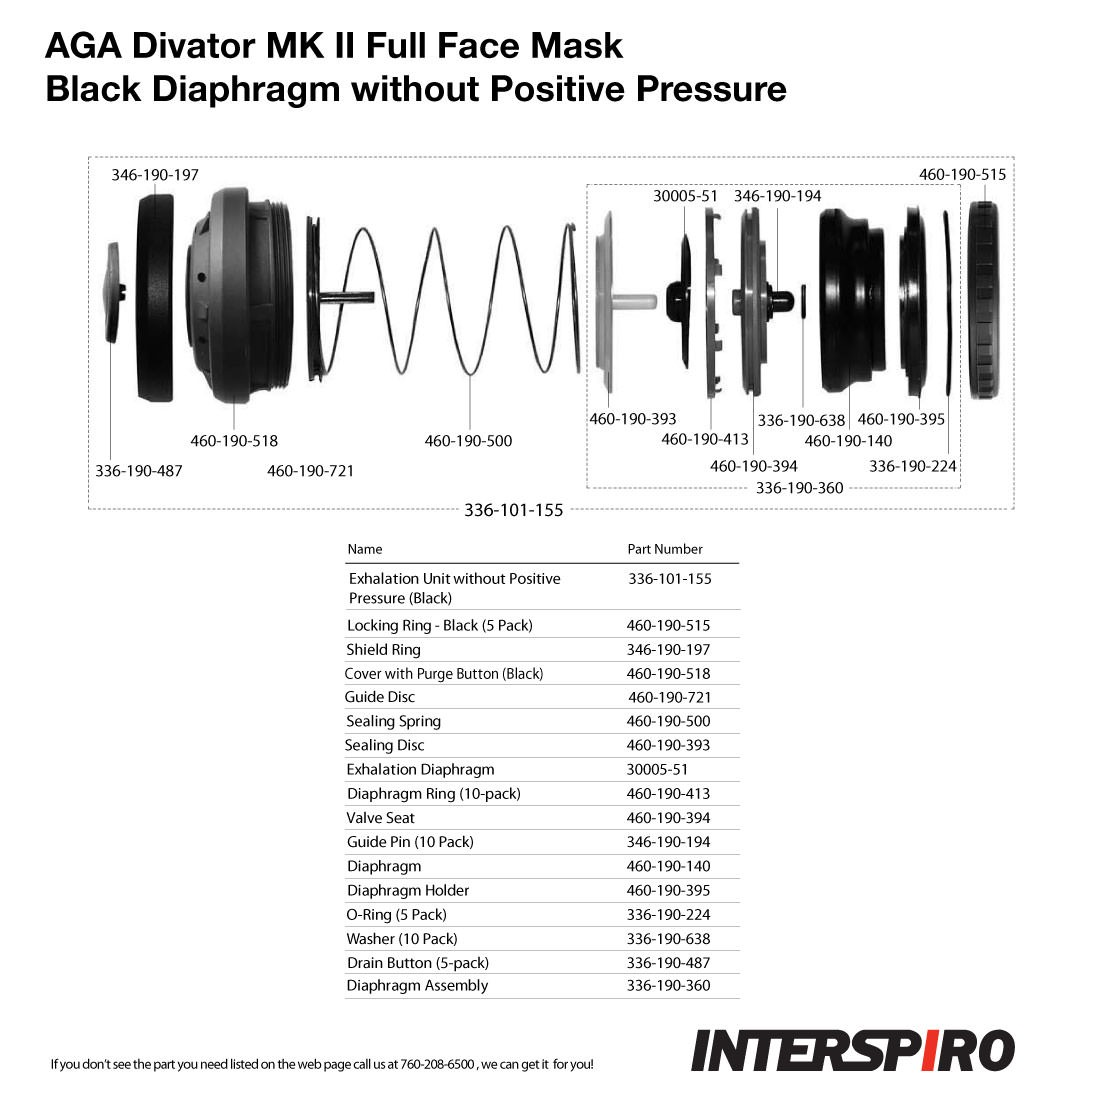 Interspiro AGA Divator MK II Full Face Mask with Demand Regulator - Silicone - Black - Diaphragm